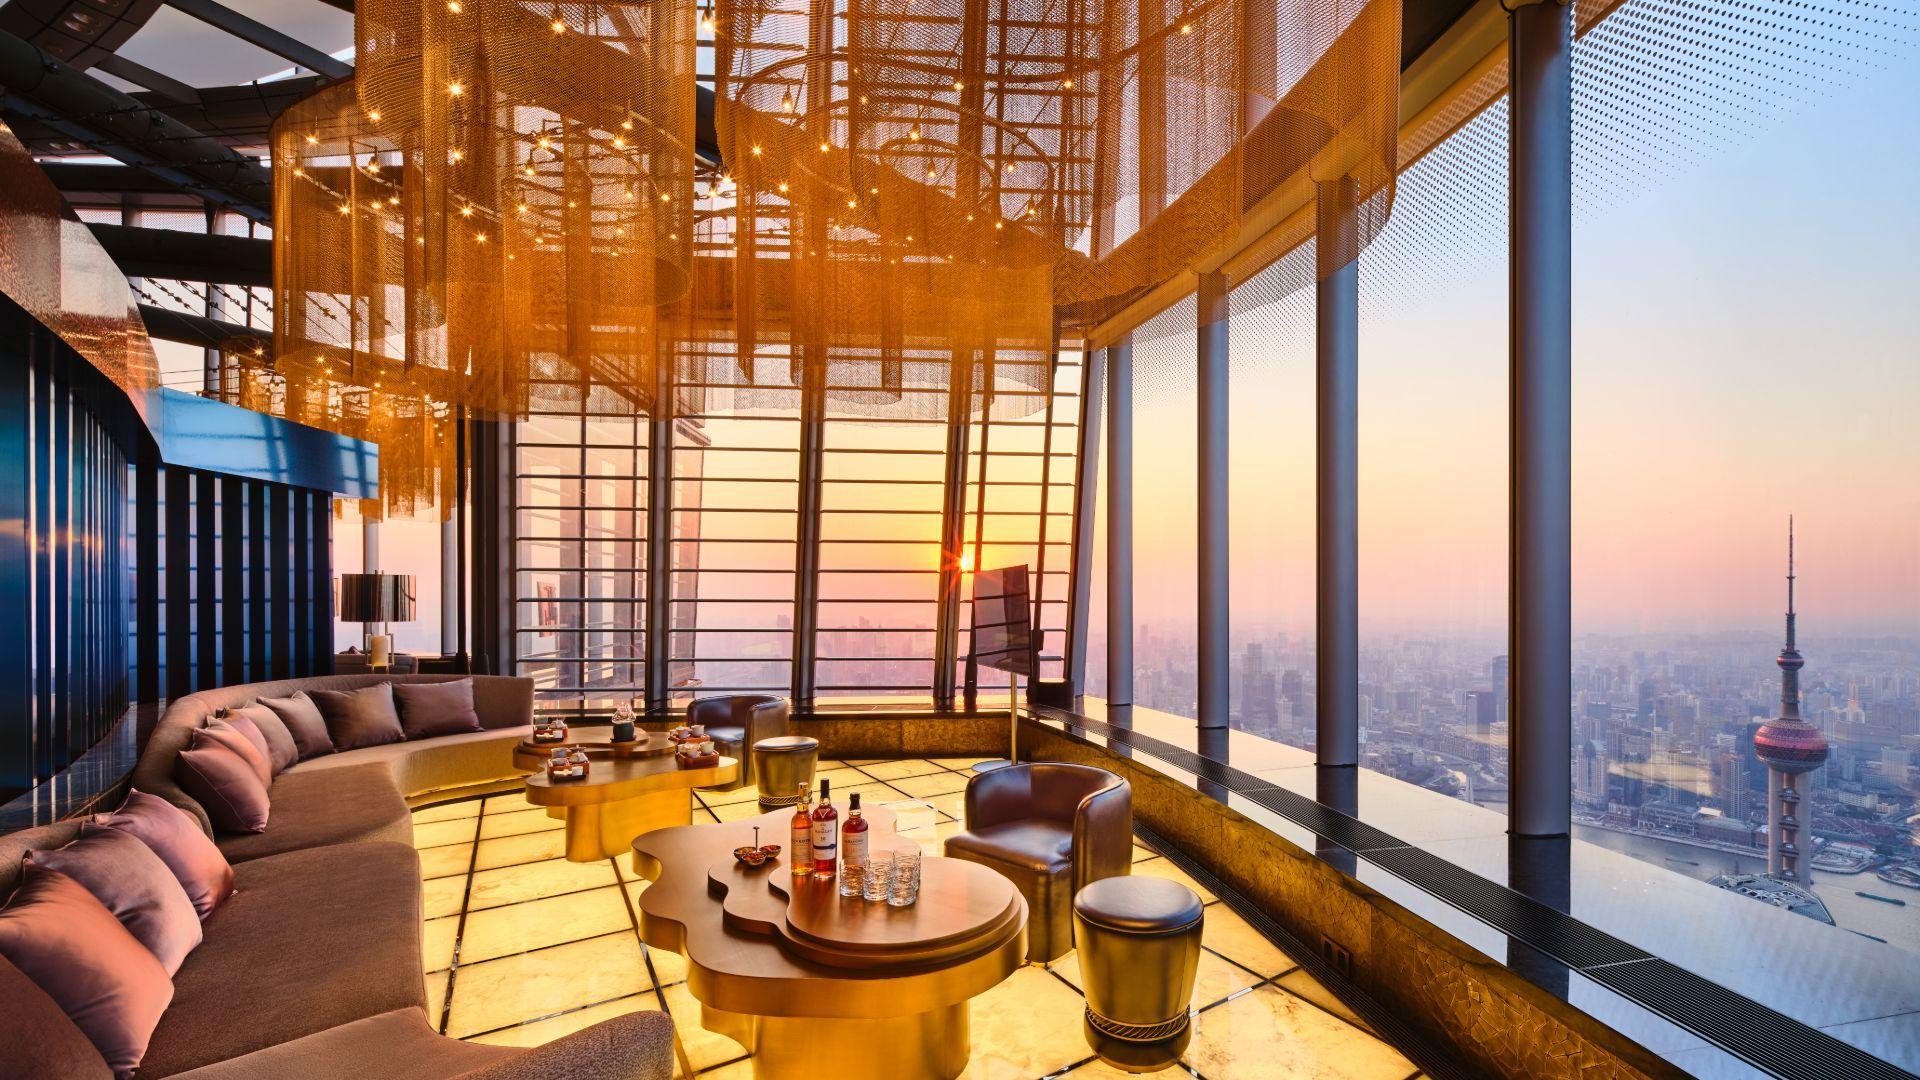 Shanghai Opens The World's Highest Luxury Hotel, J Hotel